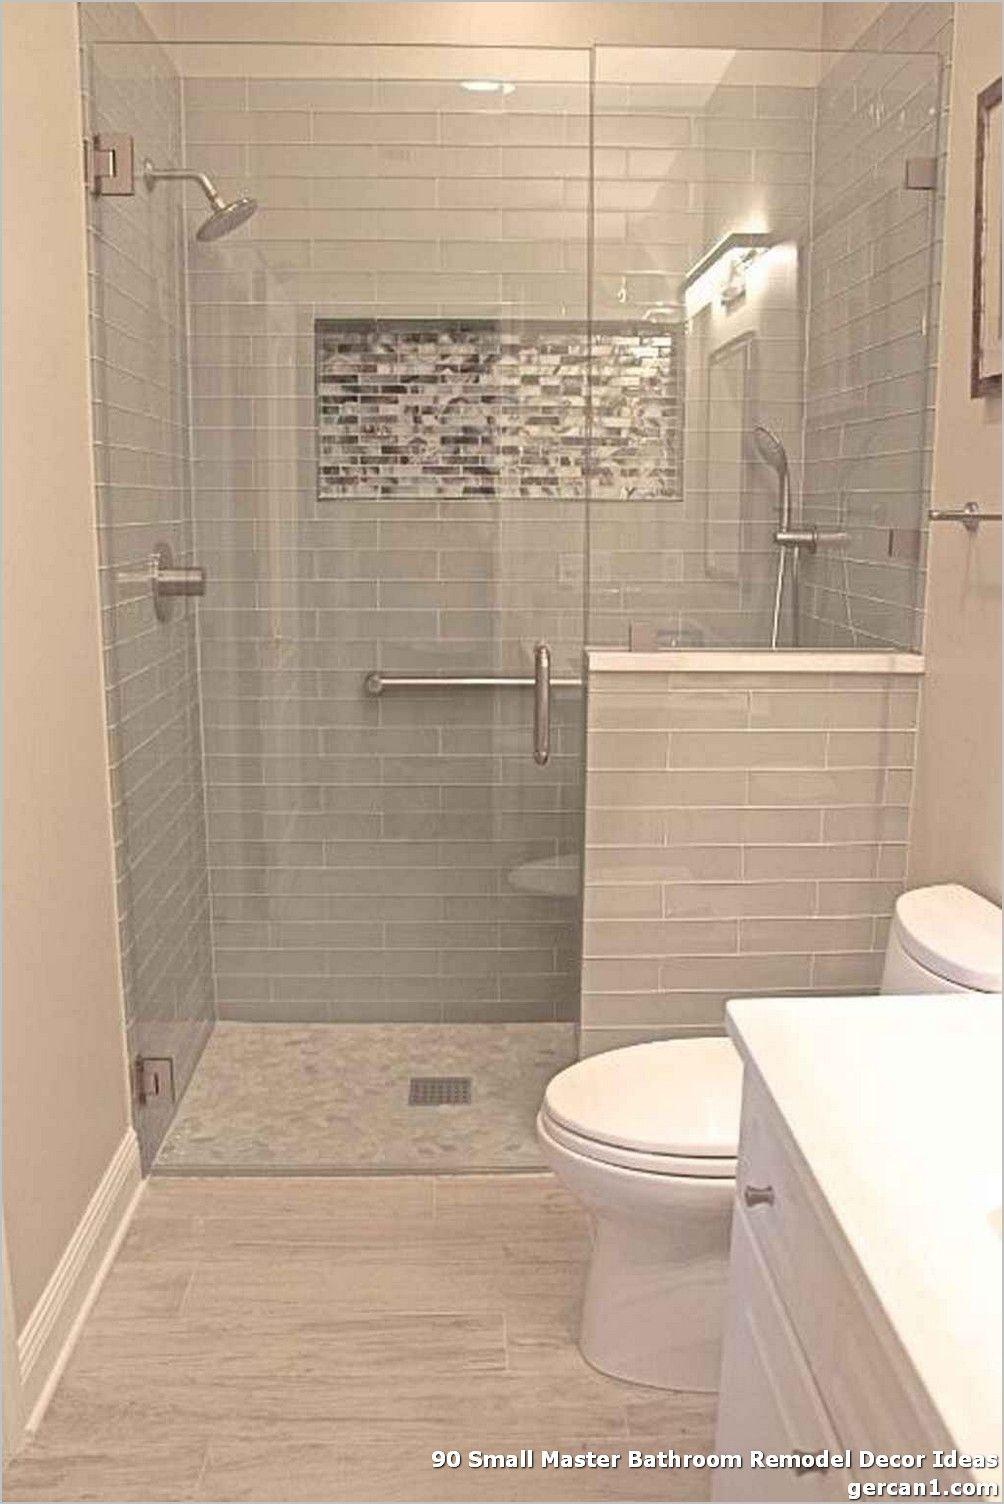 90 Small Master Bathroom Remodel Decor Ideas Page 84 Of 90 Best Home Decor Bathroom Remodel Shower Cheap Bathroom Remodel Bathroom Design Small